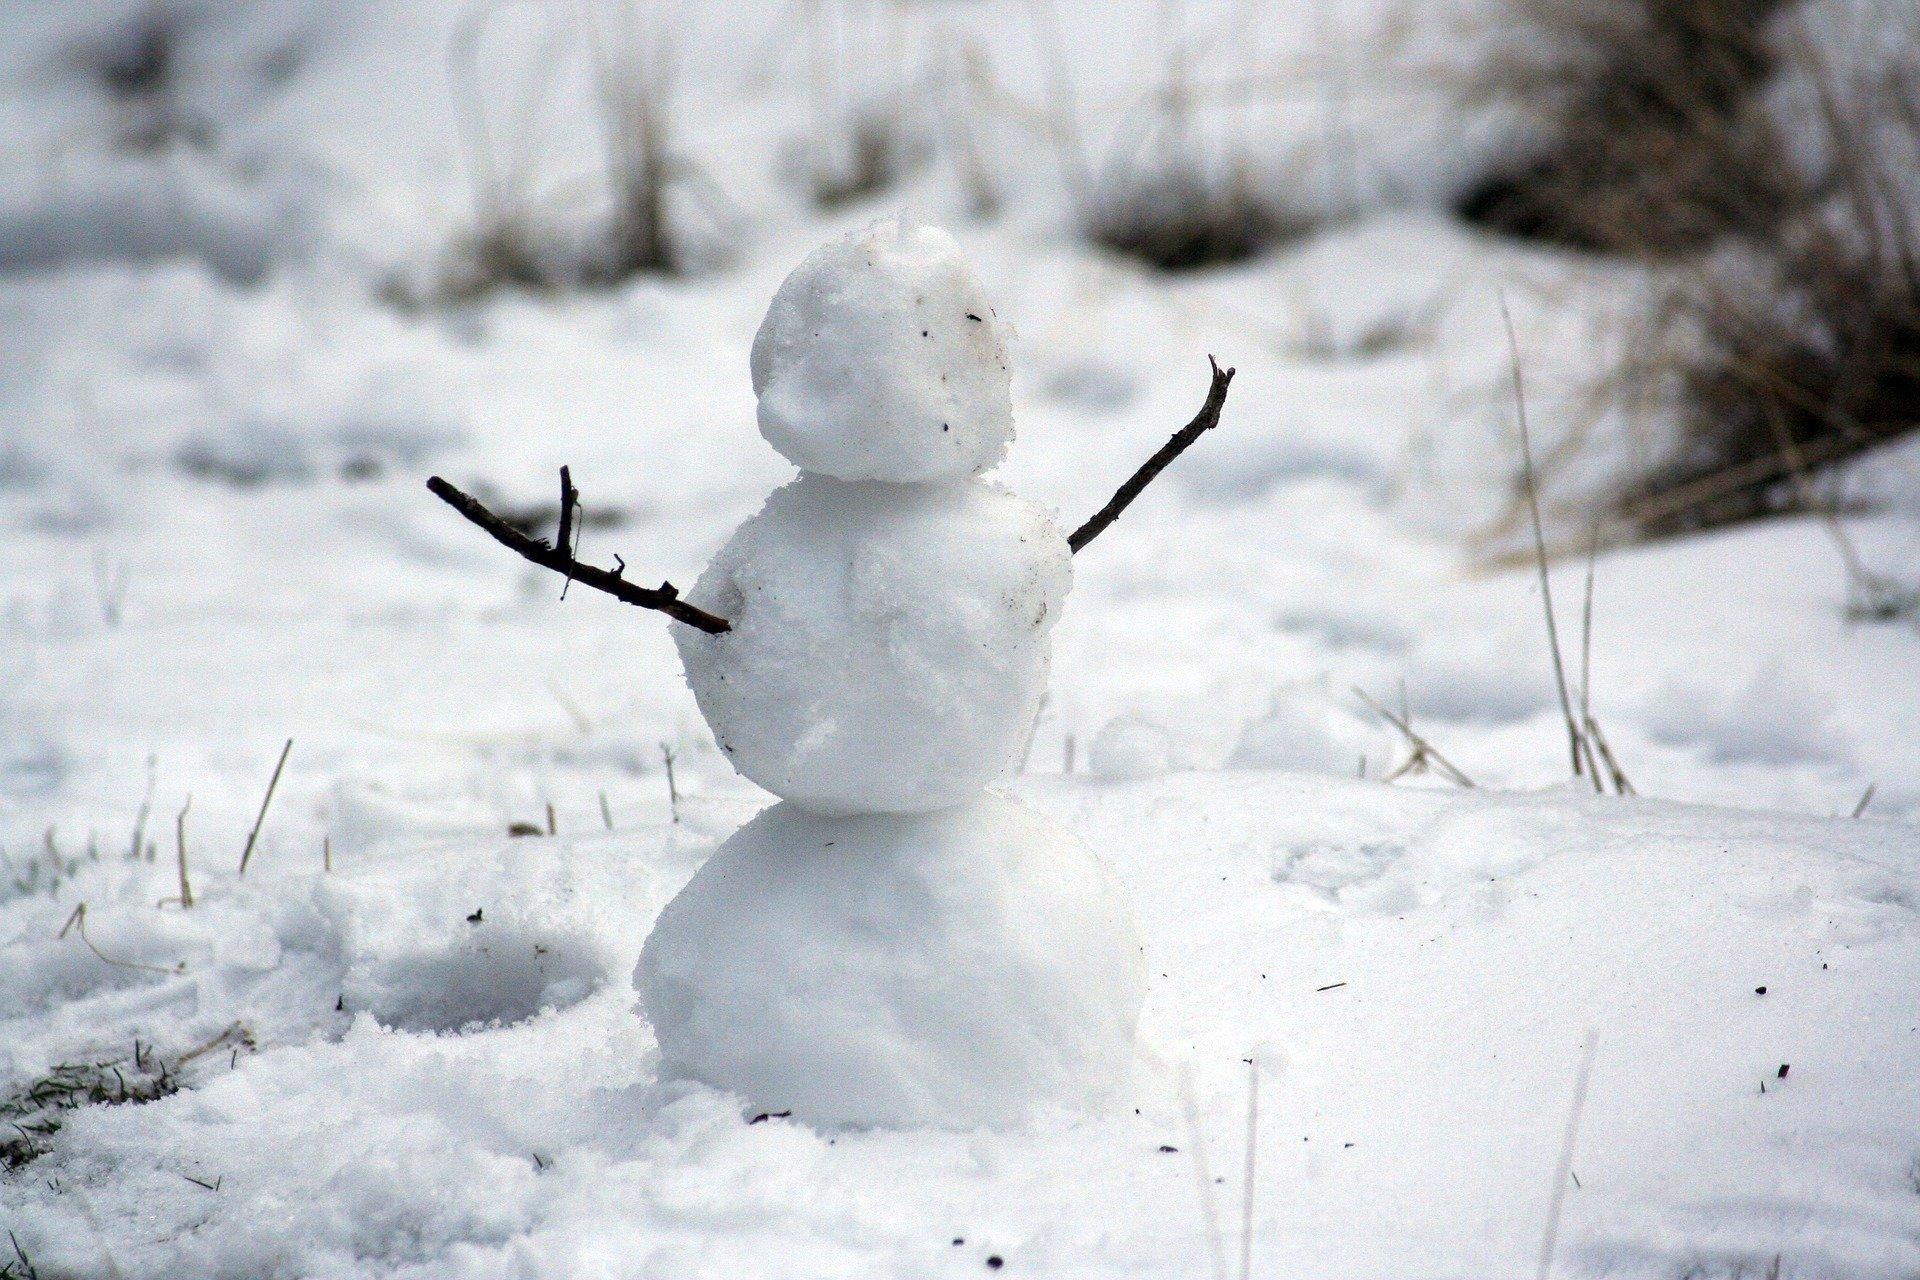 7612-snowman-1210018-1920.jpg